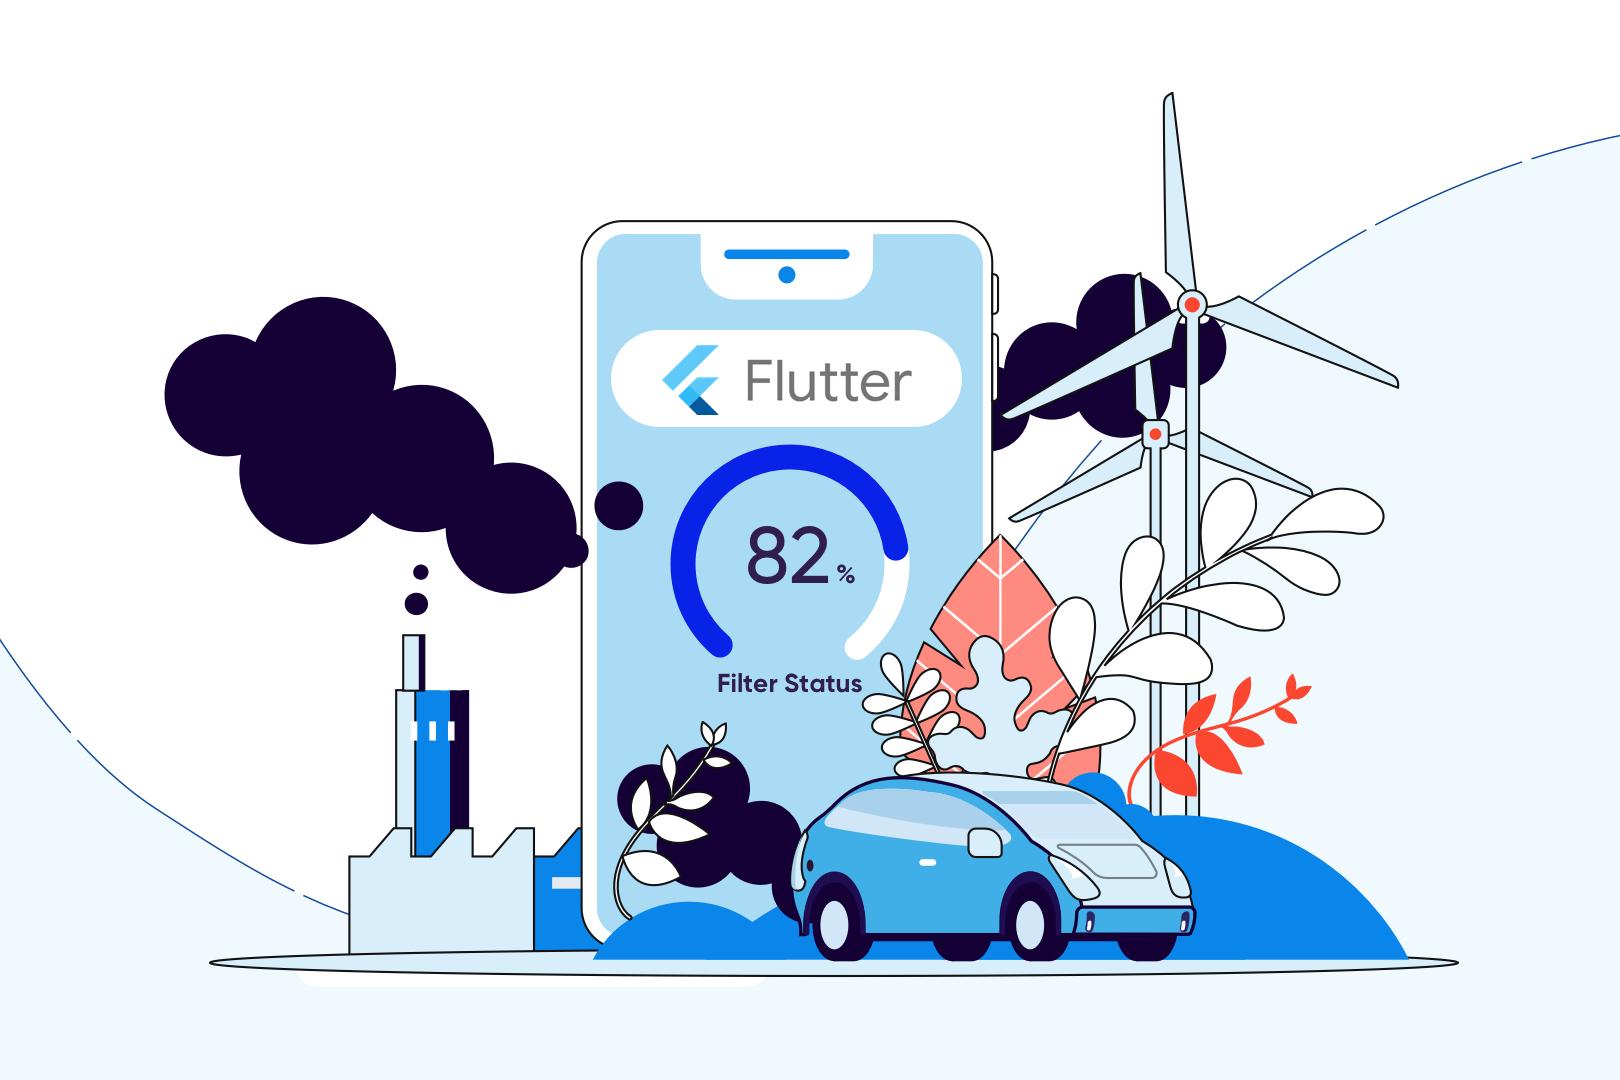 I've got some Flutter problems but my Flutter app ain't one